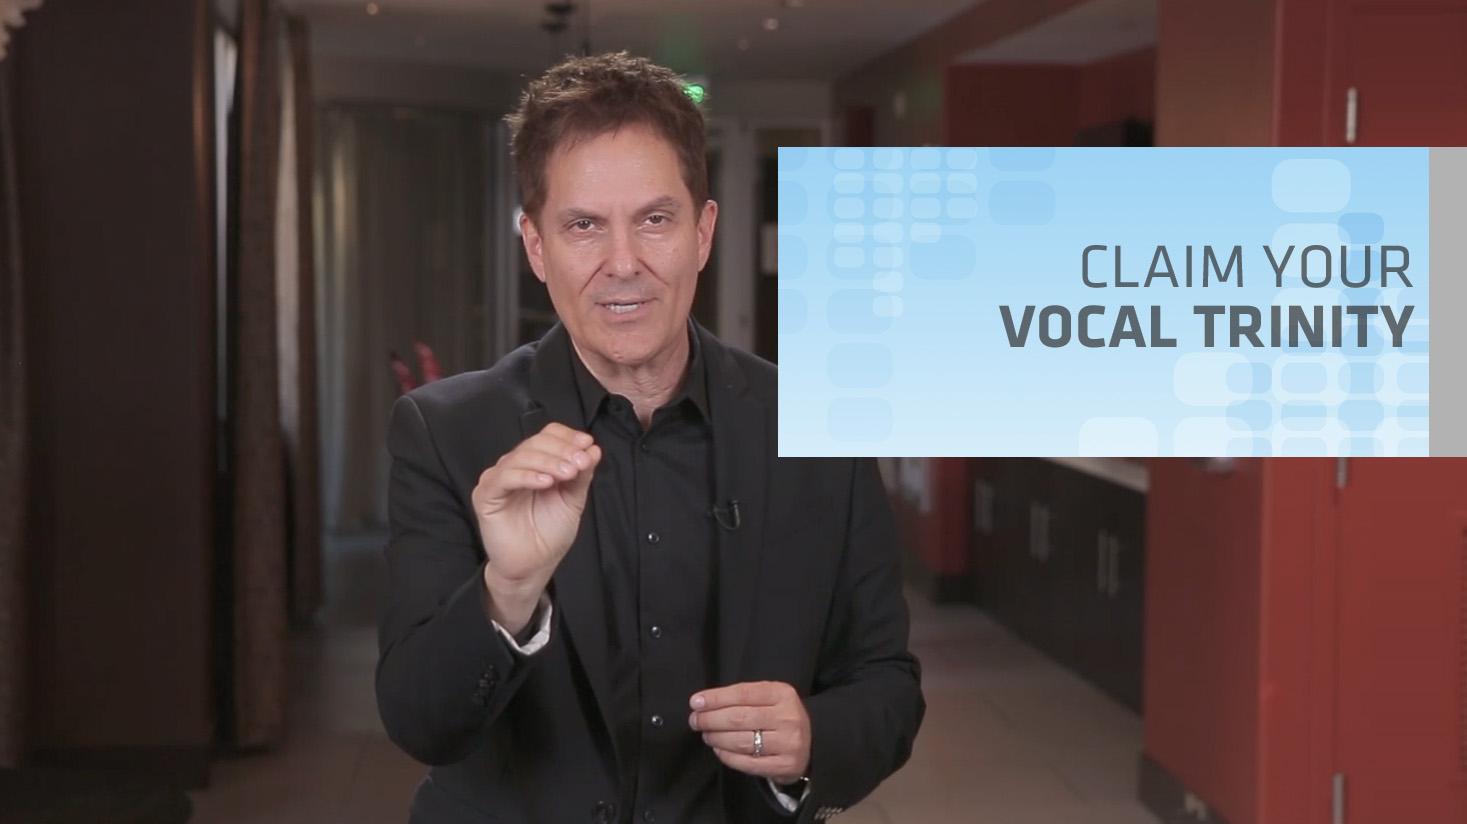 Claim Your Vocal Trinity